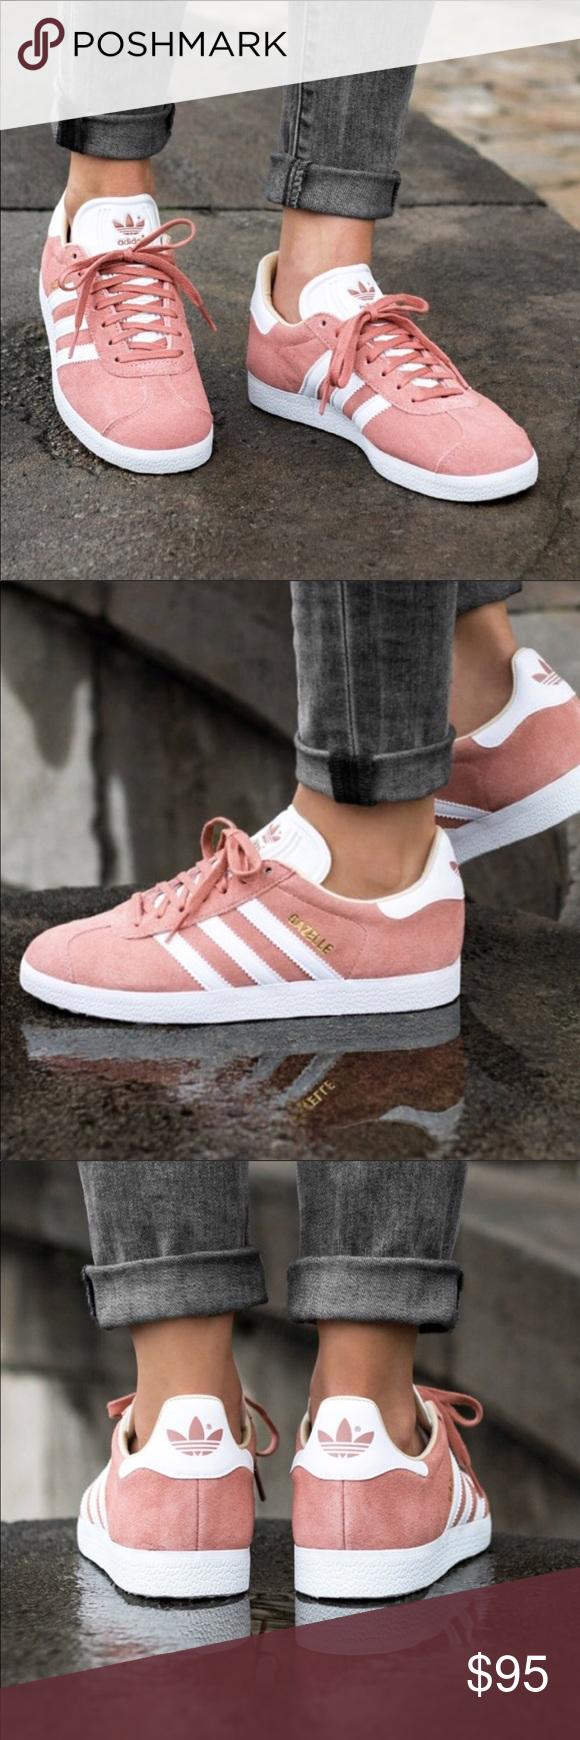 New adidas gazelle ash pink suede 6.5